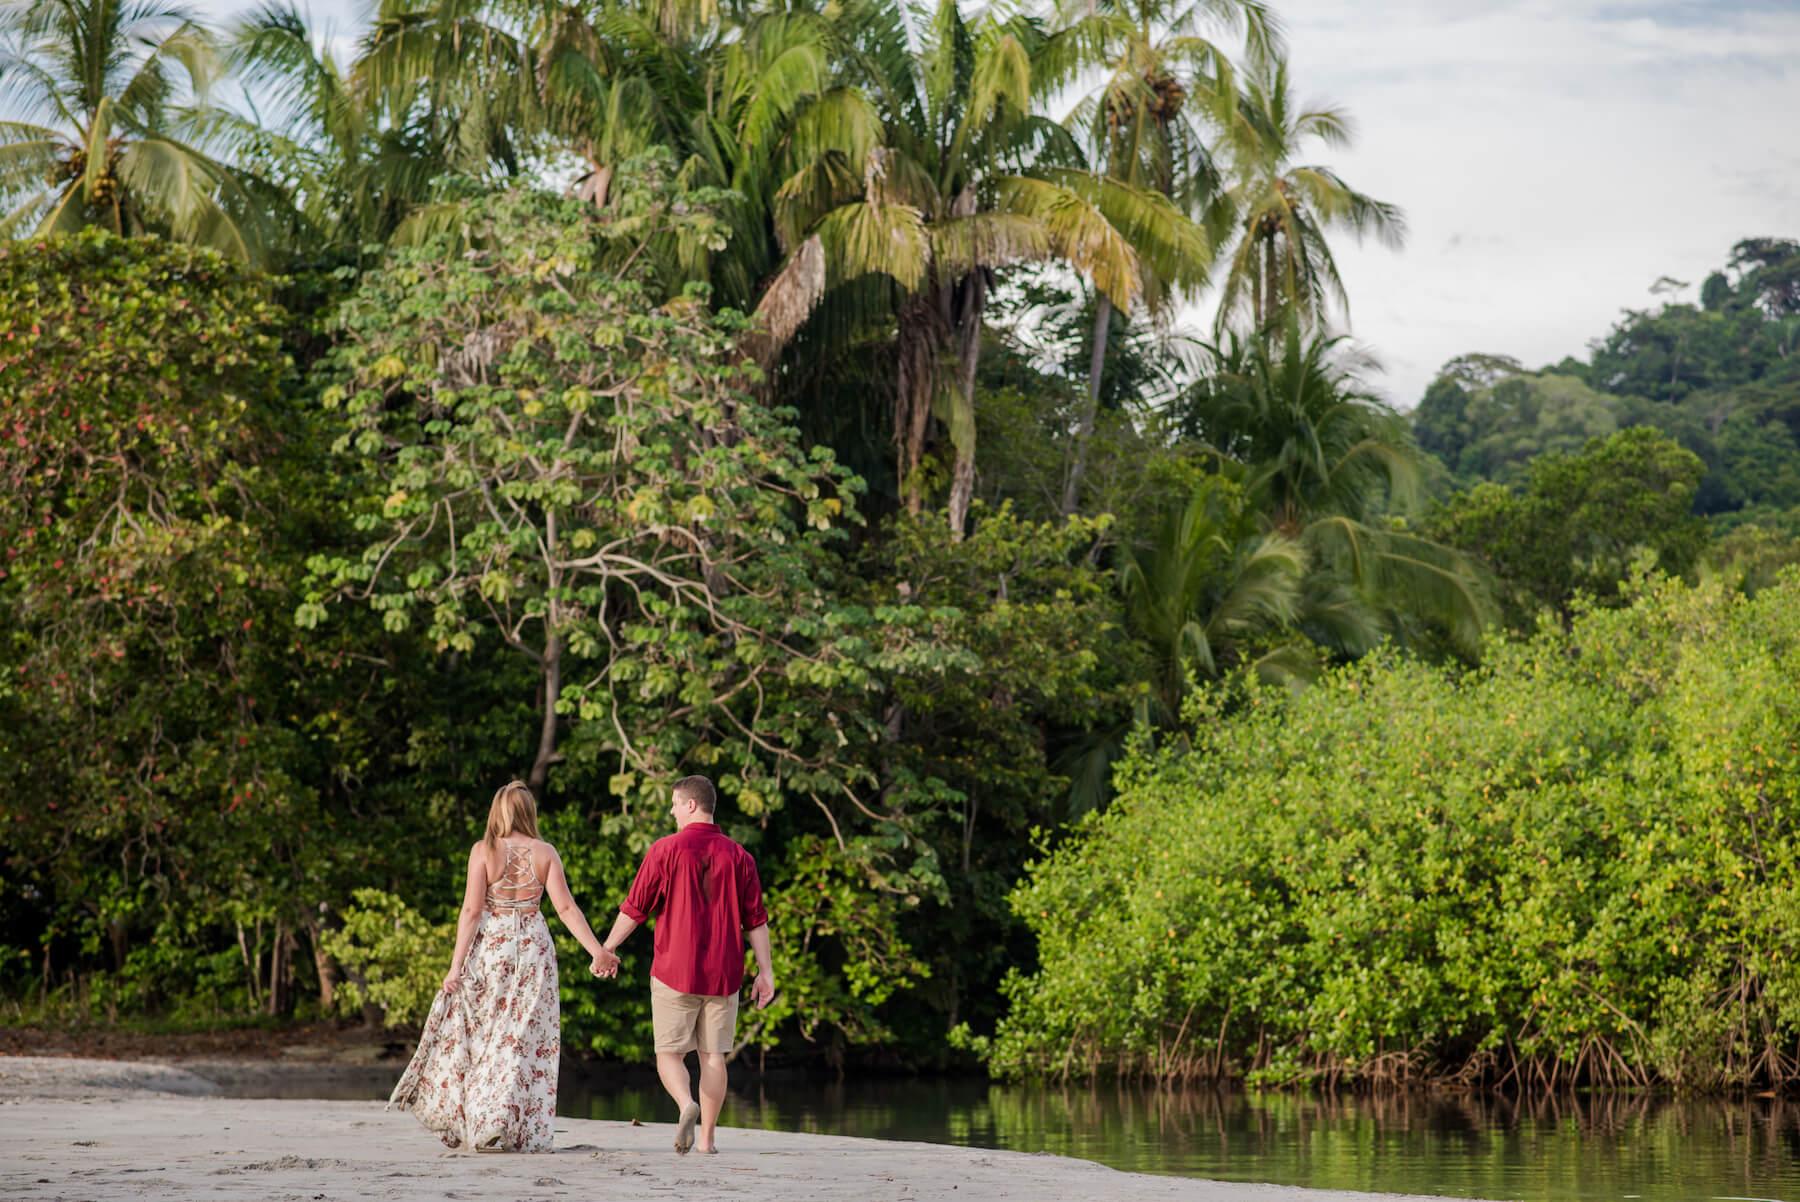 couple walking down the beach in Manuel Antonio, Costa Rica